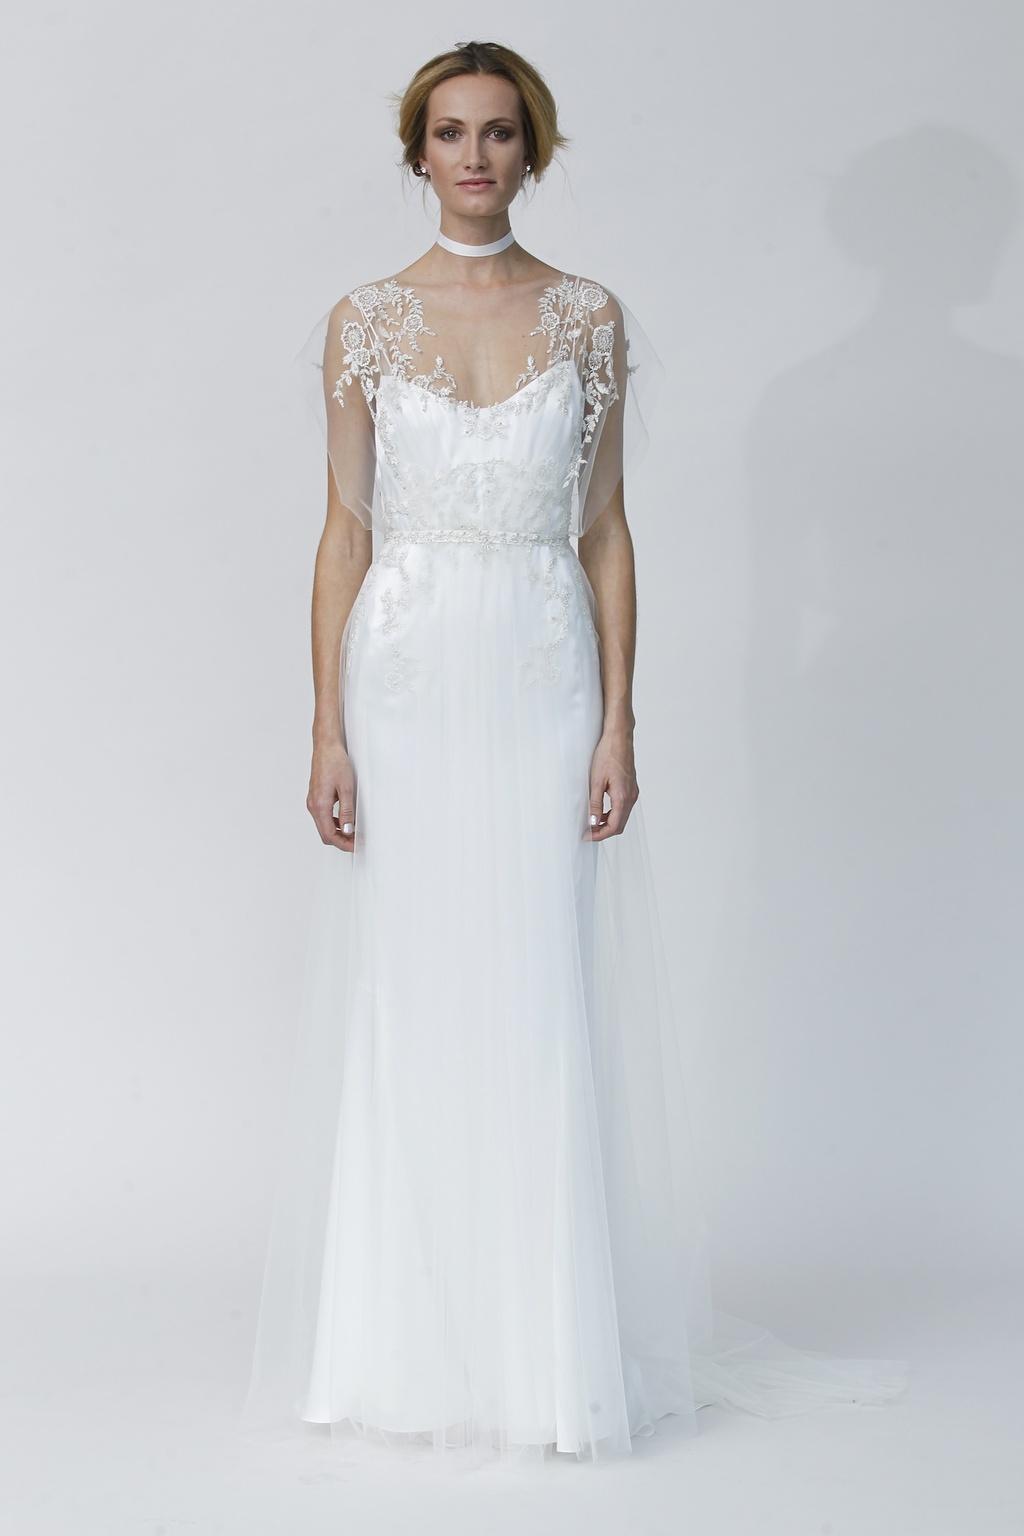 Letta-wedding-dress-by-rivini-fall-2014-bridal.full